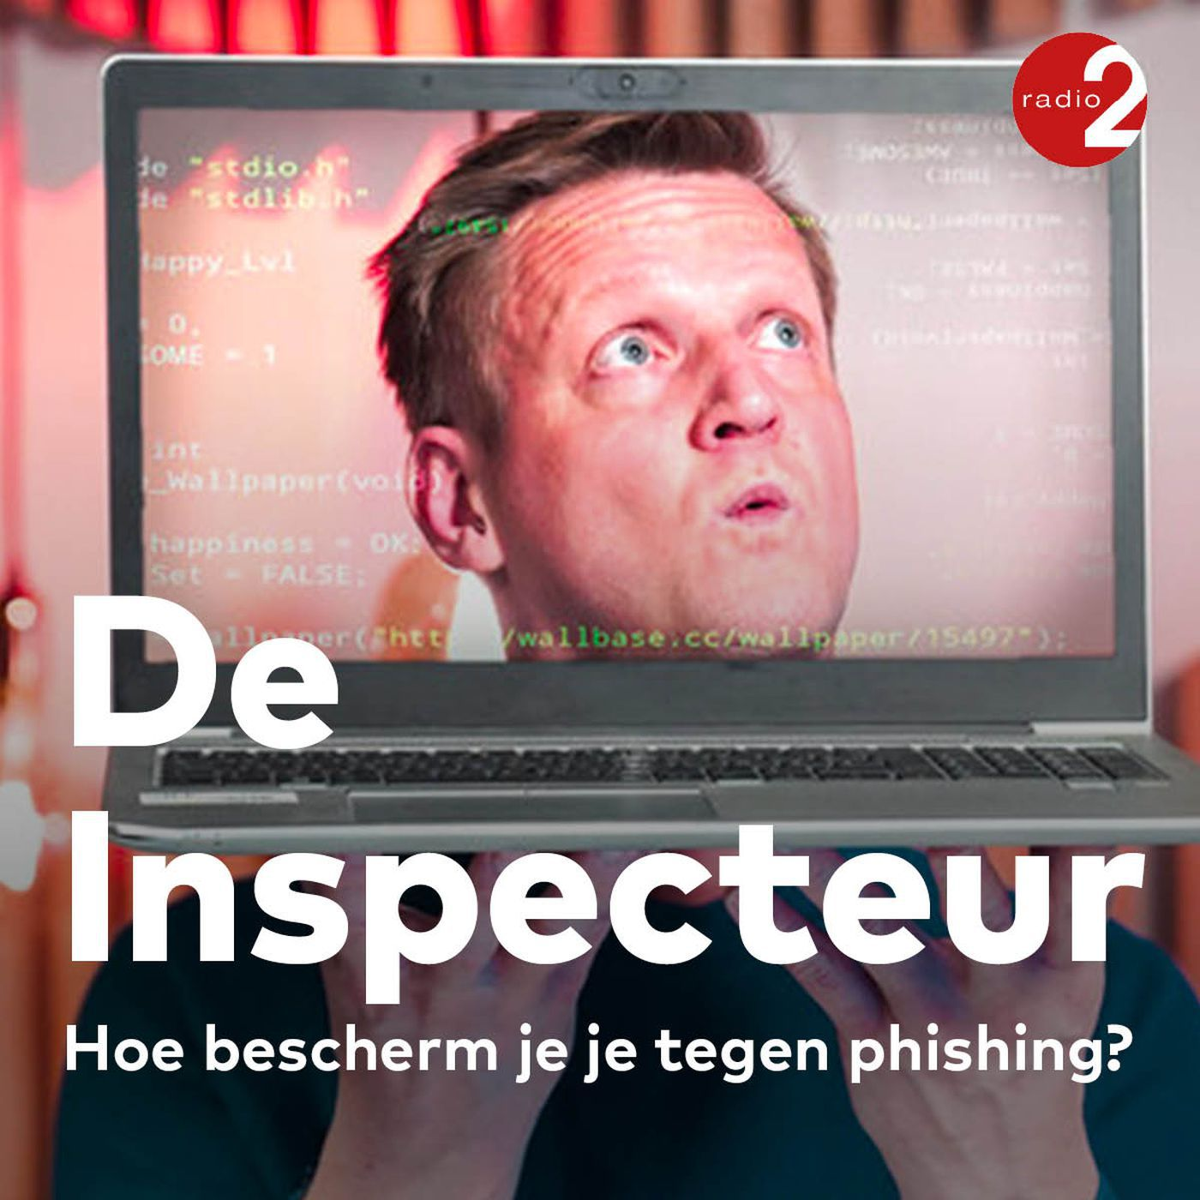 Hoe bescherm je je tegen phishing?